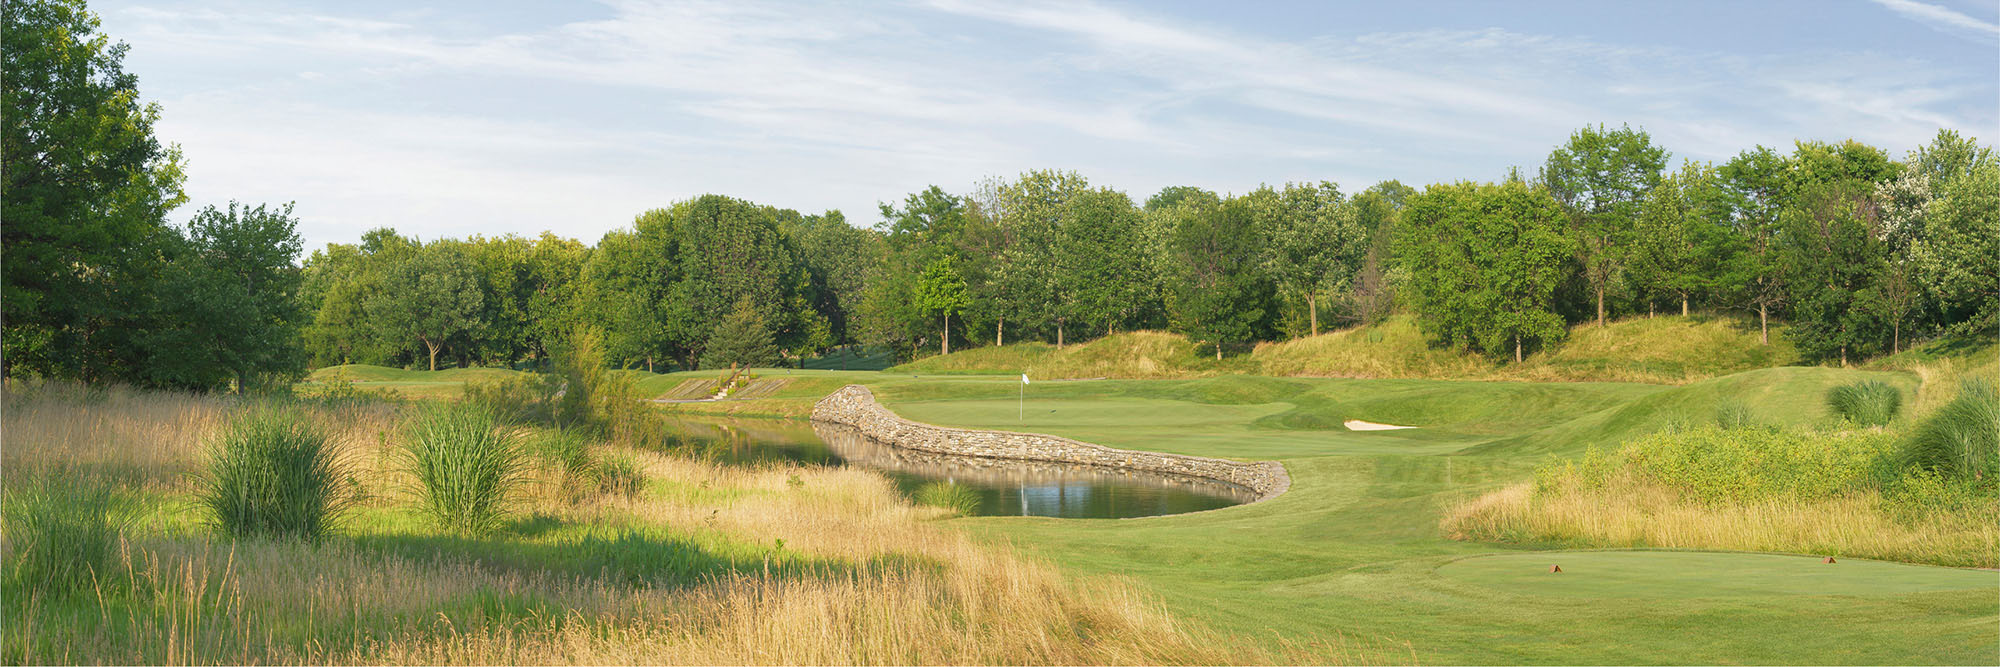 Golf Course Image - Heritage Club No. 3